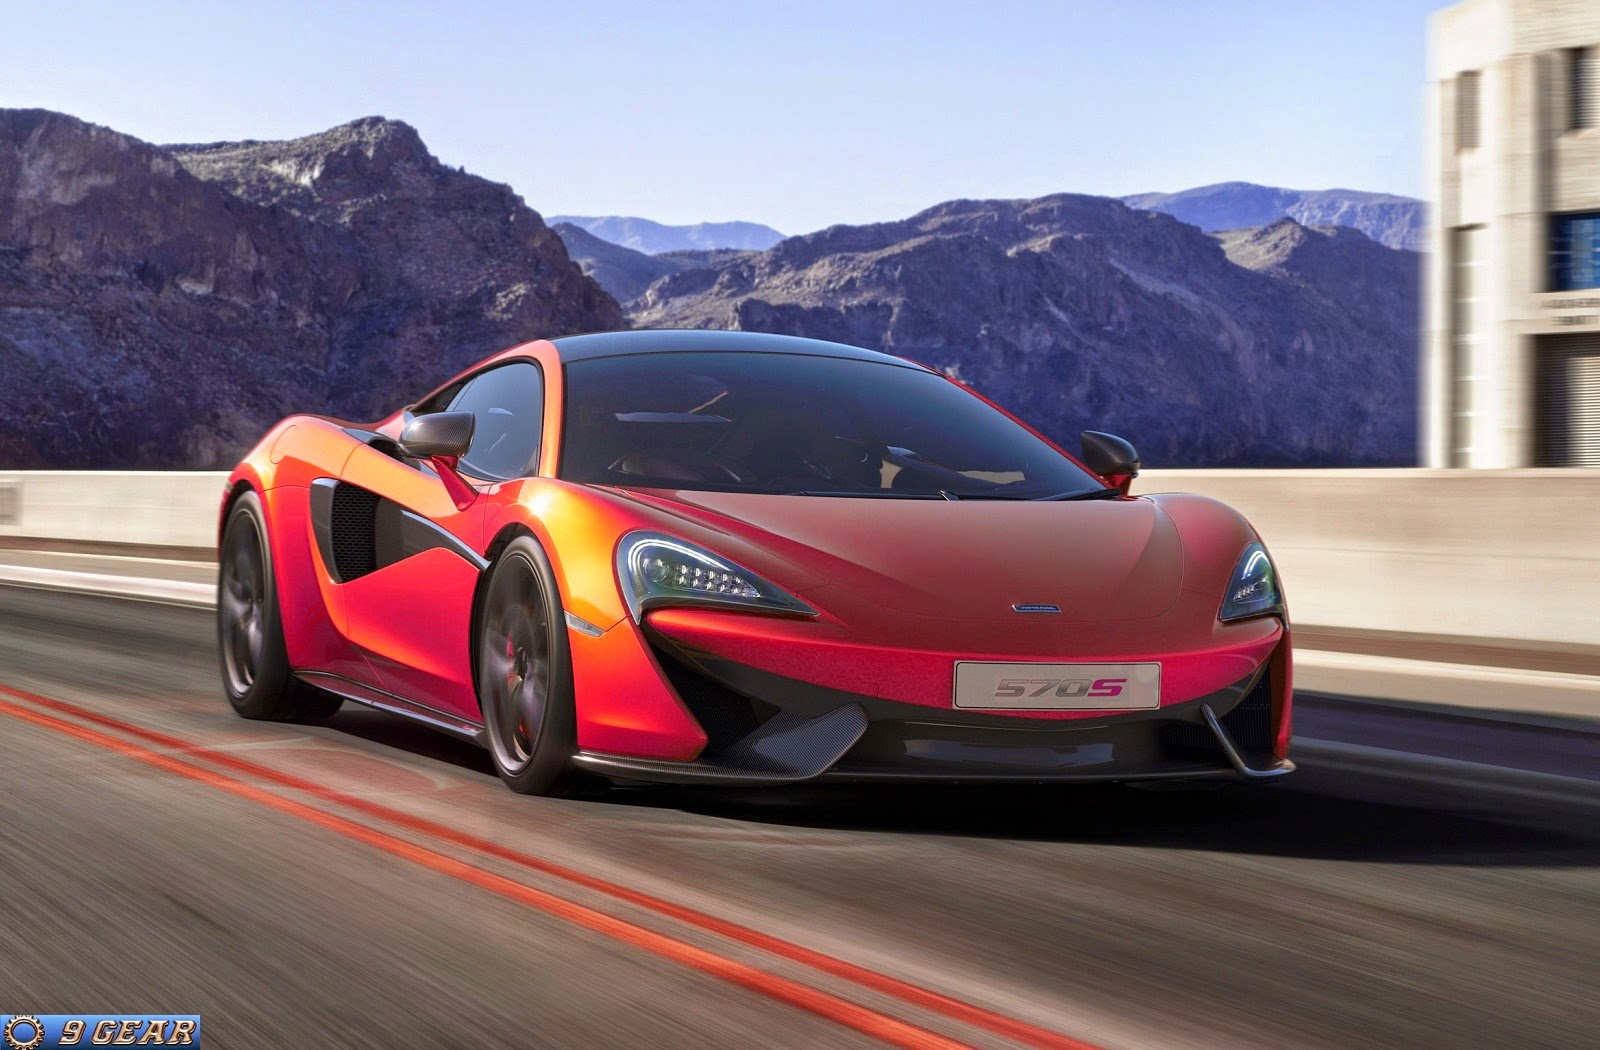 http://3.bp.blogspot.com/-DWKMm1GUB-o/VRwflRJ9nzI/AAAAAAAAa5s/KxQhXzqZ04E/s1600/2016-McLaren-570s-Coupe-014.jpg